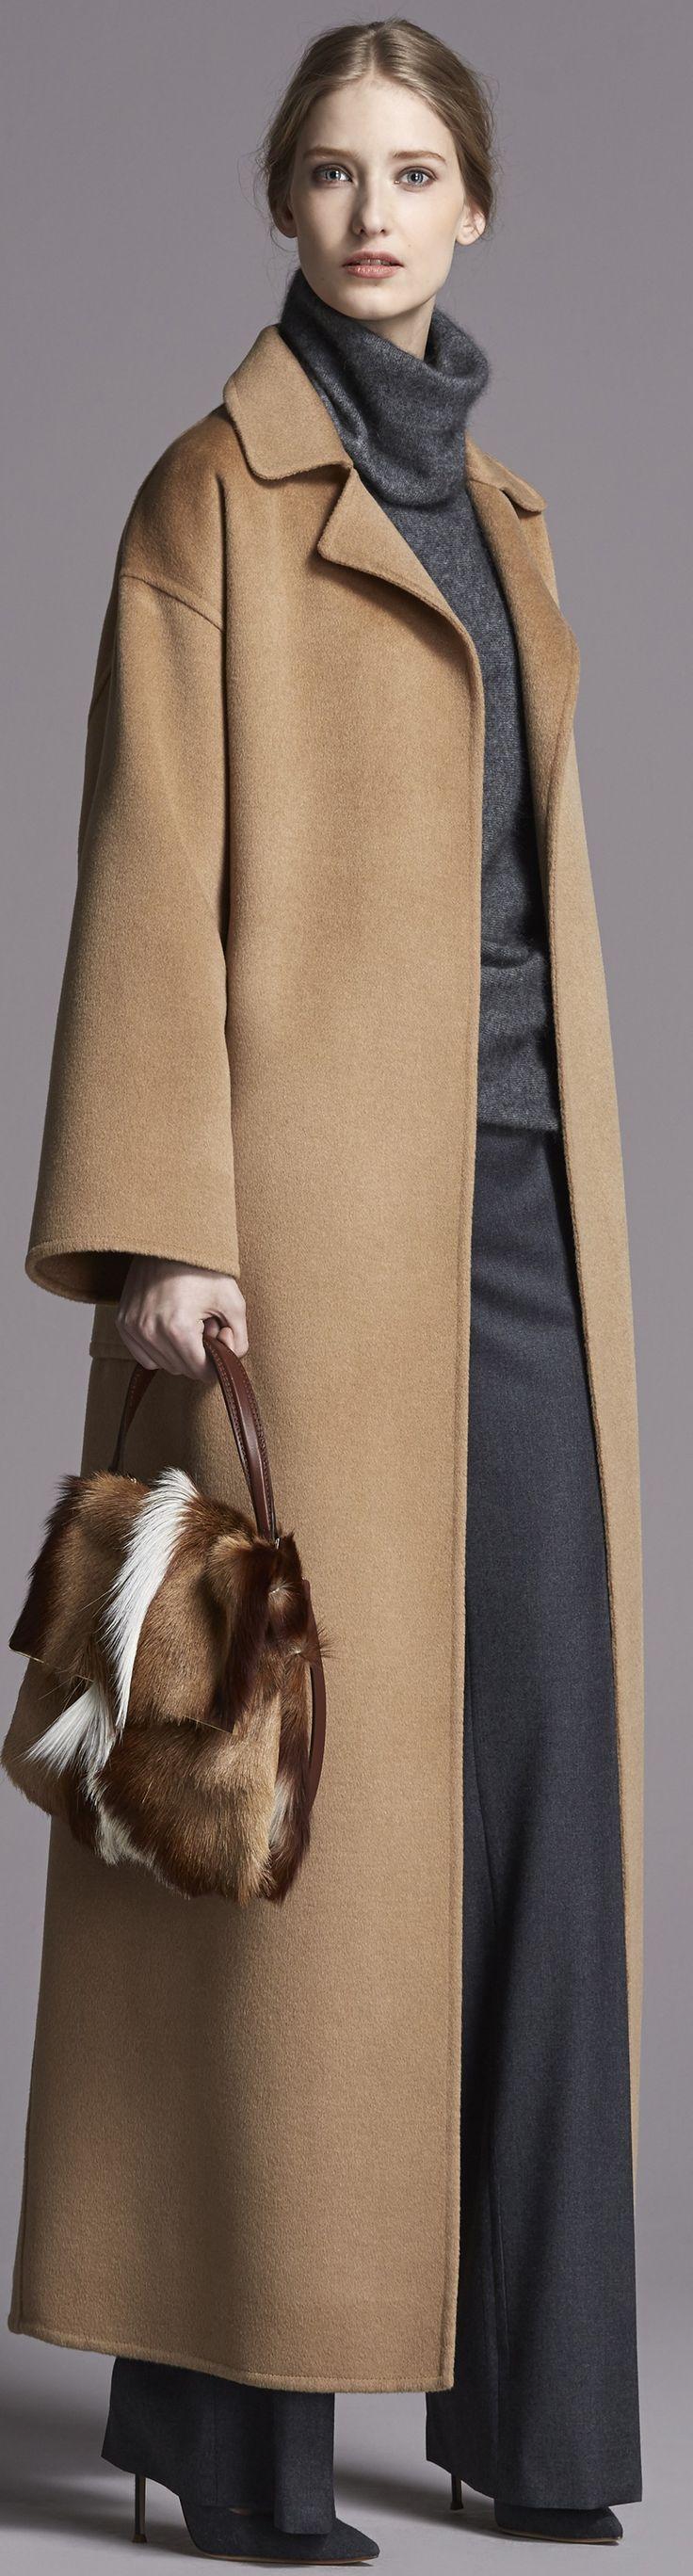 Beautiful Carolina Herrera coat, cowl, and slacks. NOT HAPPY about the Springbok Antelope hide bag however!!!